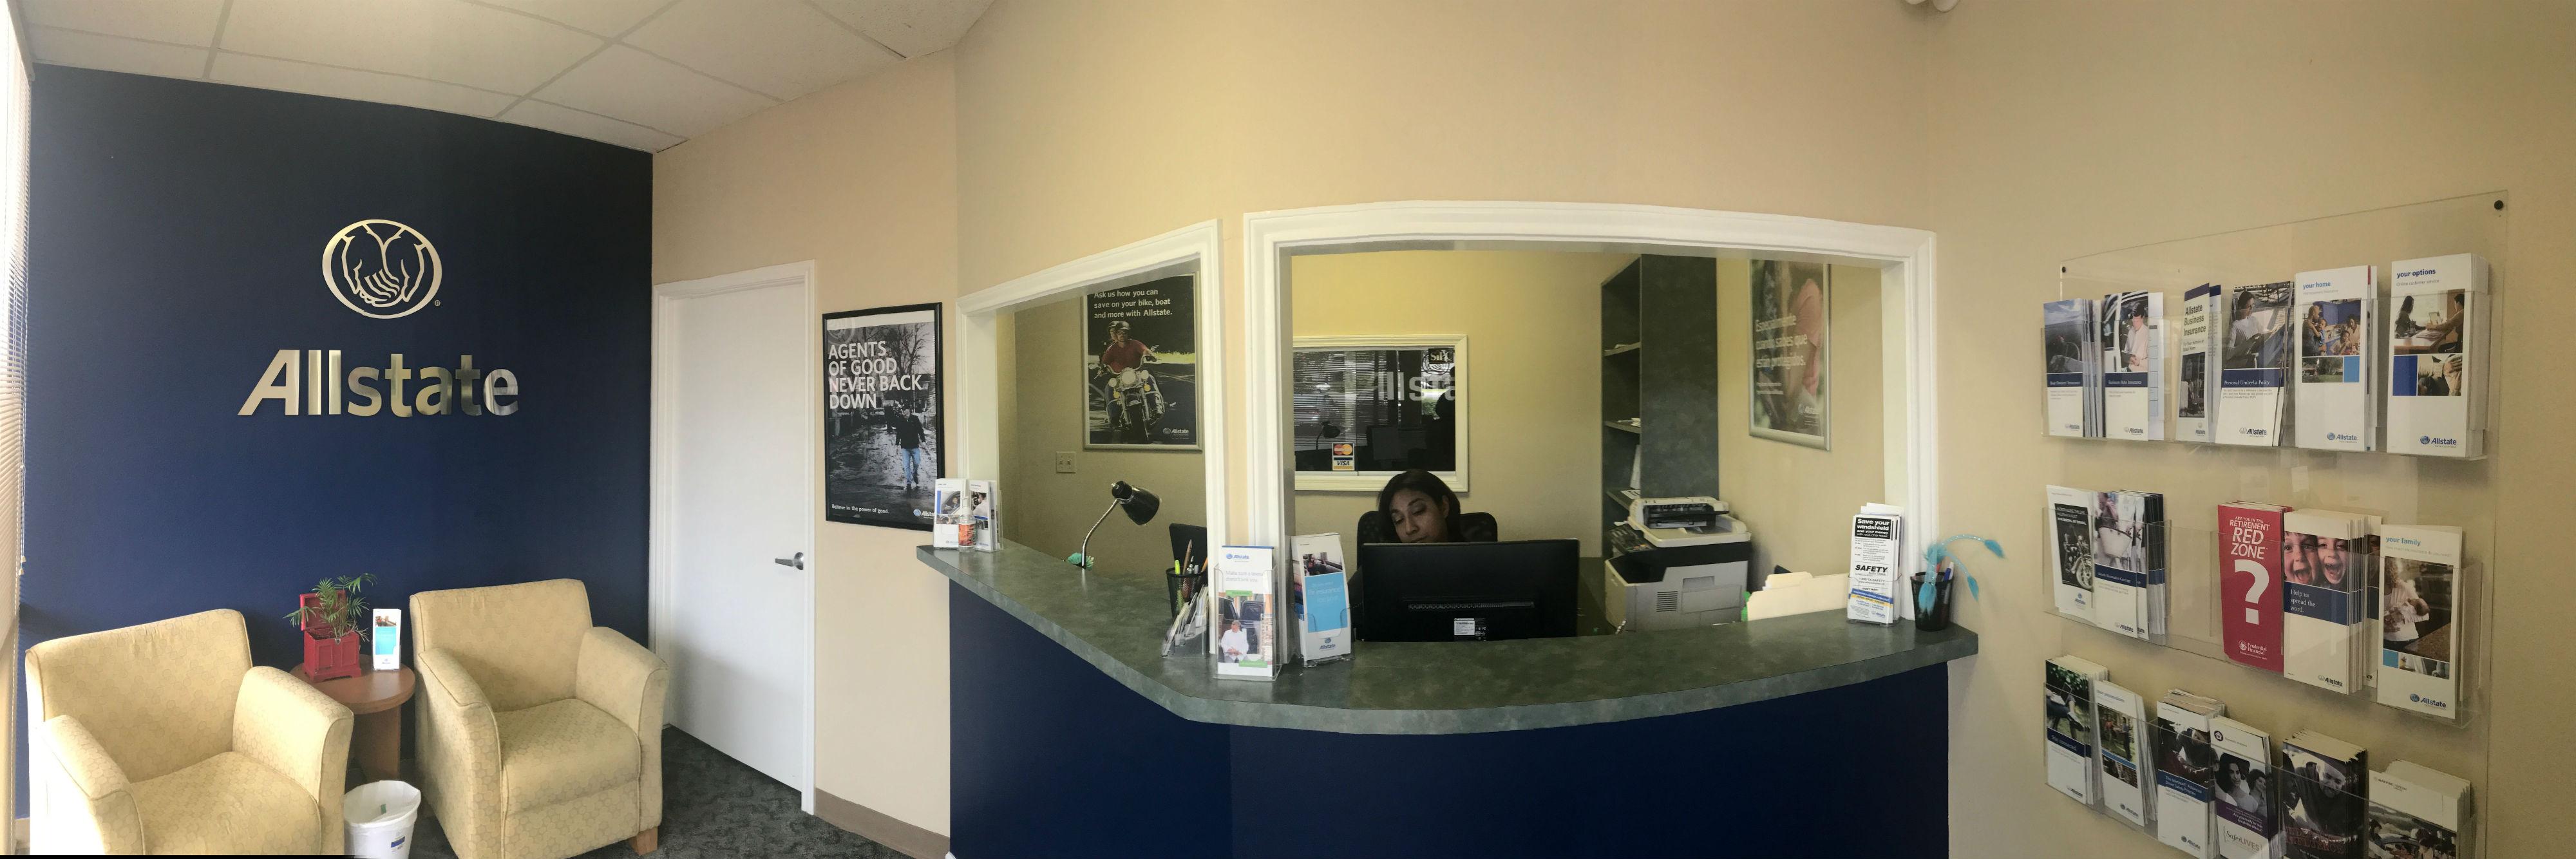 Allstate Insurance Agent Jesse Jenkins 10350 Bandera Rd Ste 118 San Antonio TX